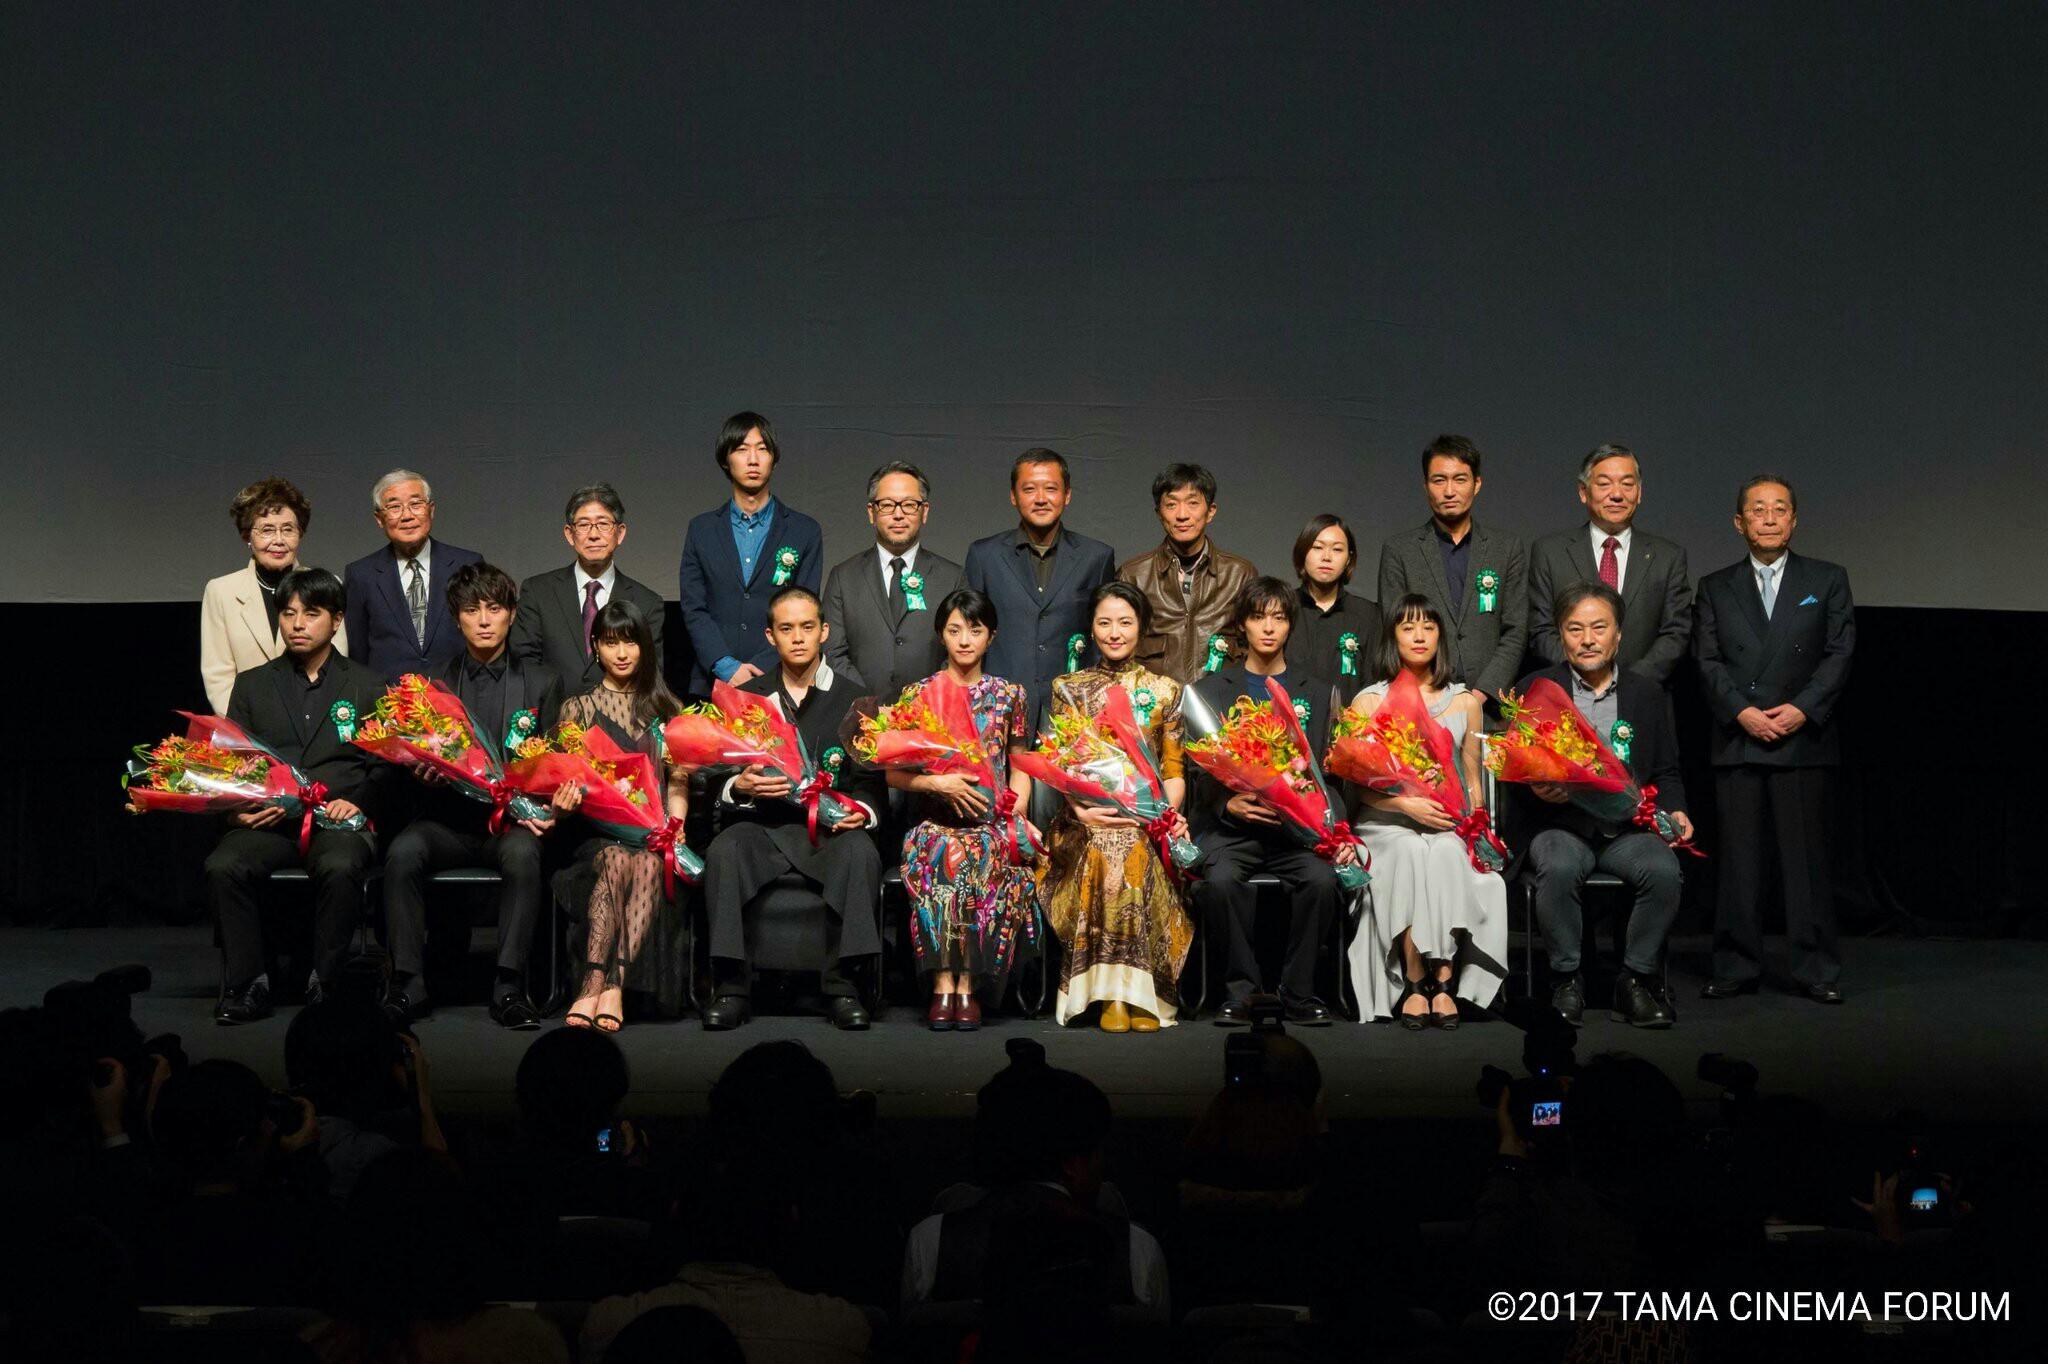 2017年TAMA映画賞授賞式